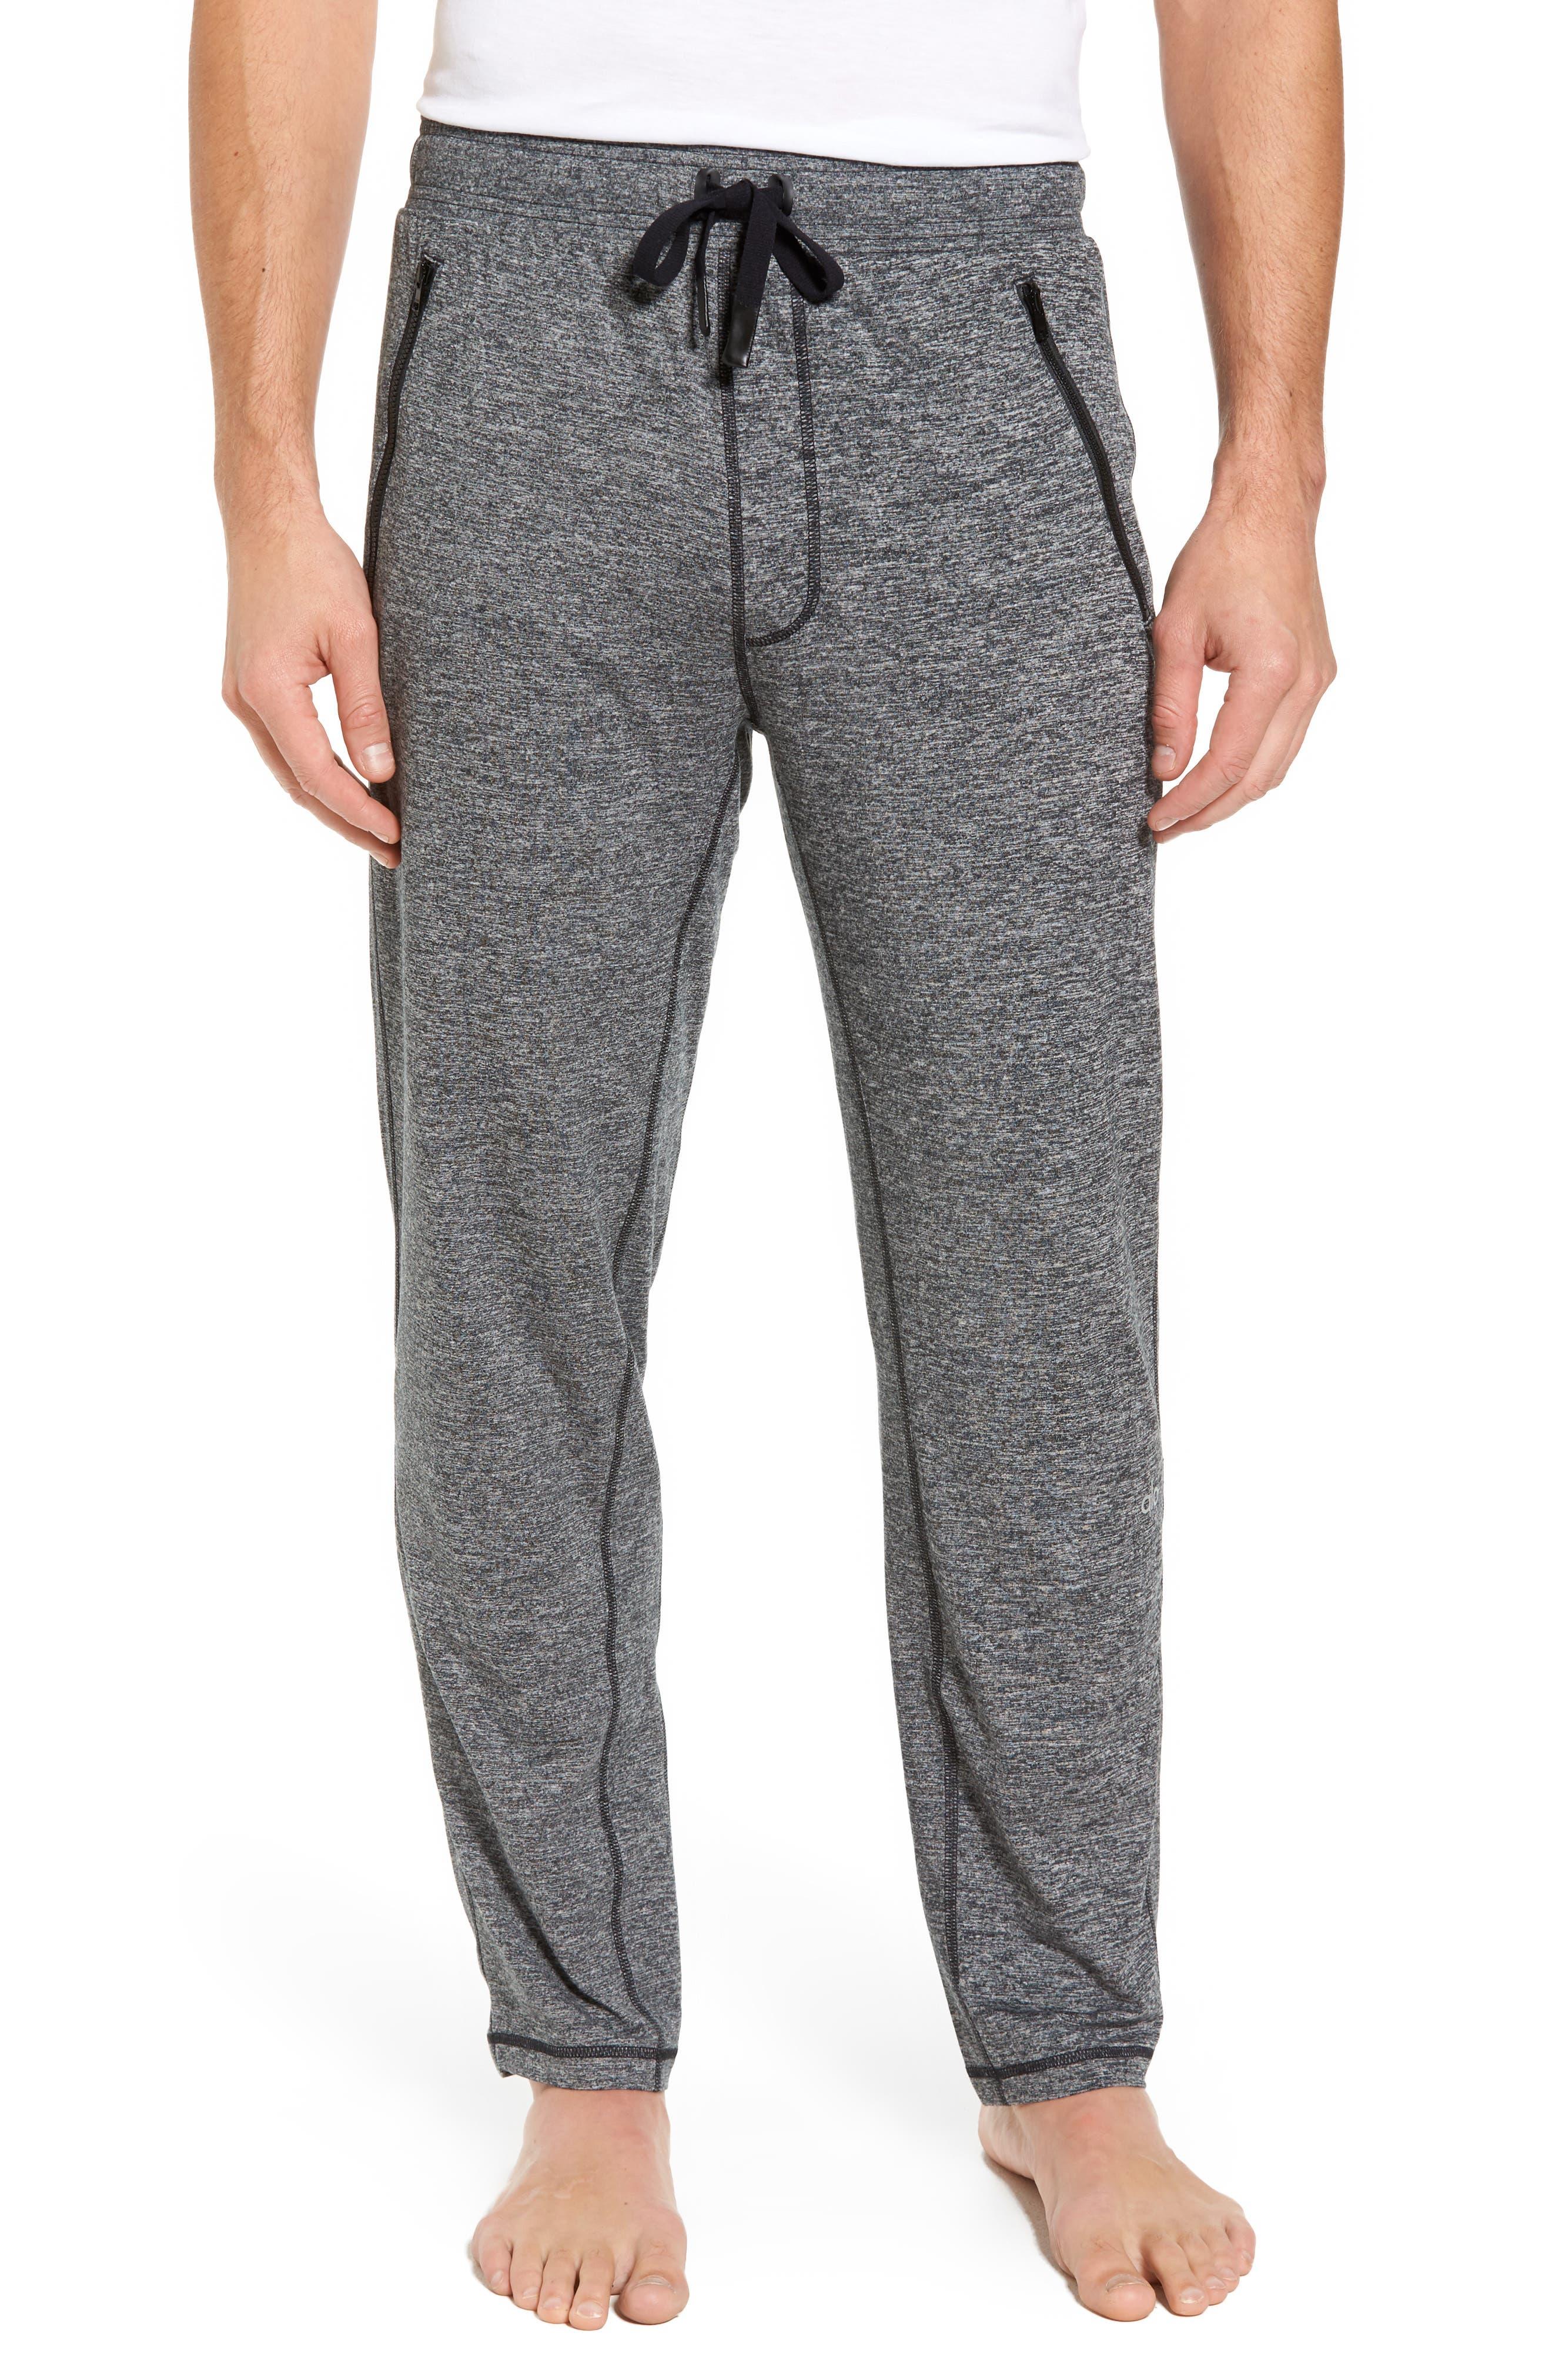 Renew Relaxed Lounge Pants,                             Main thumbnail 1, color,                             Grey Marl